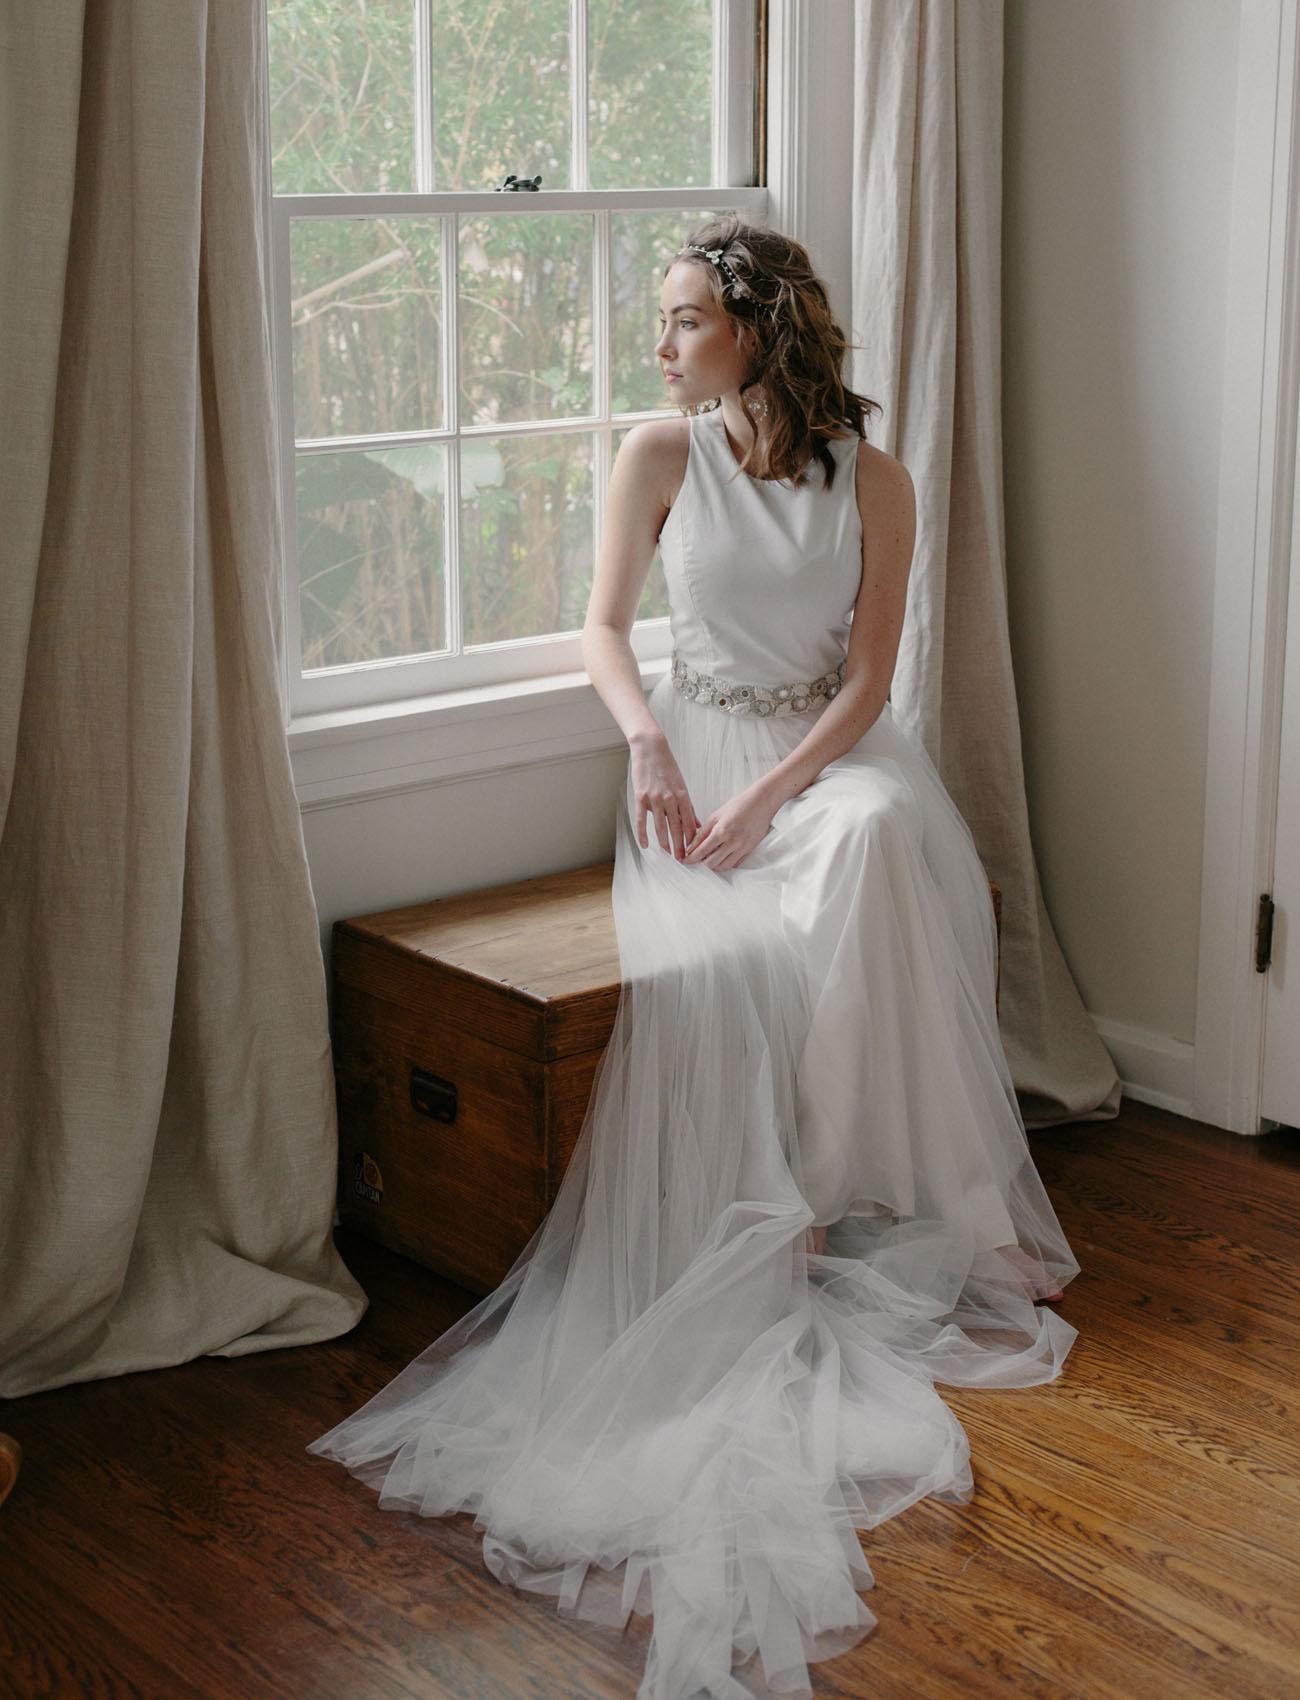 Modern Vintage Bridal Accessories from Erica Elizabeth Designs